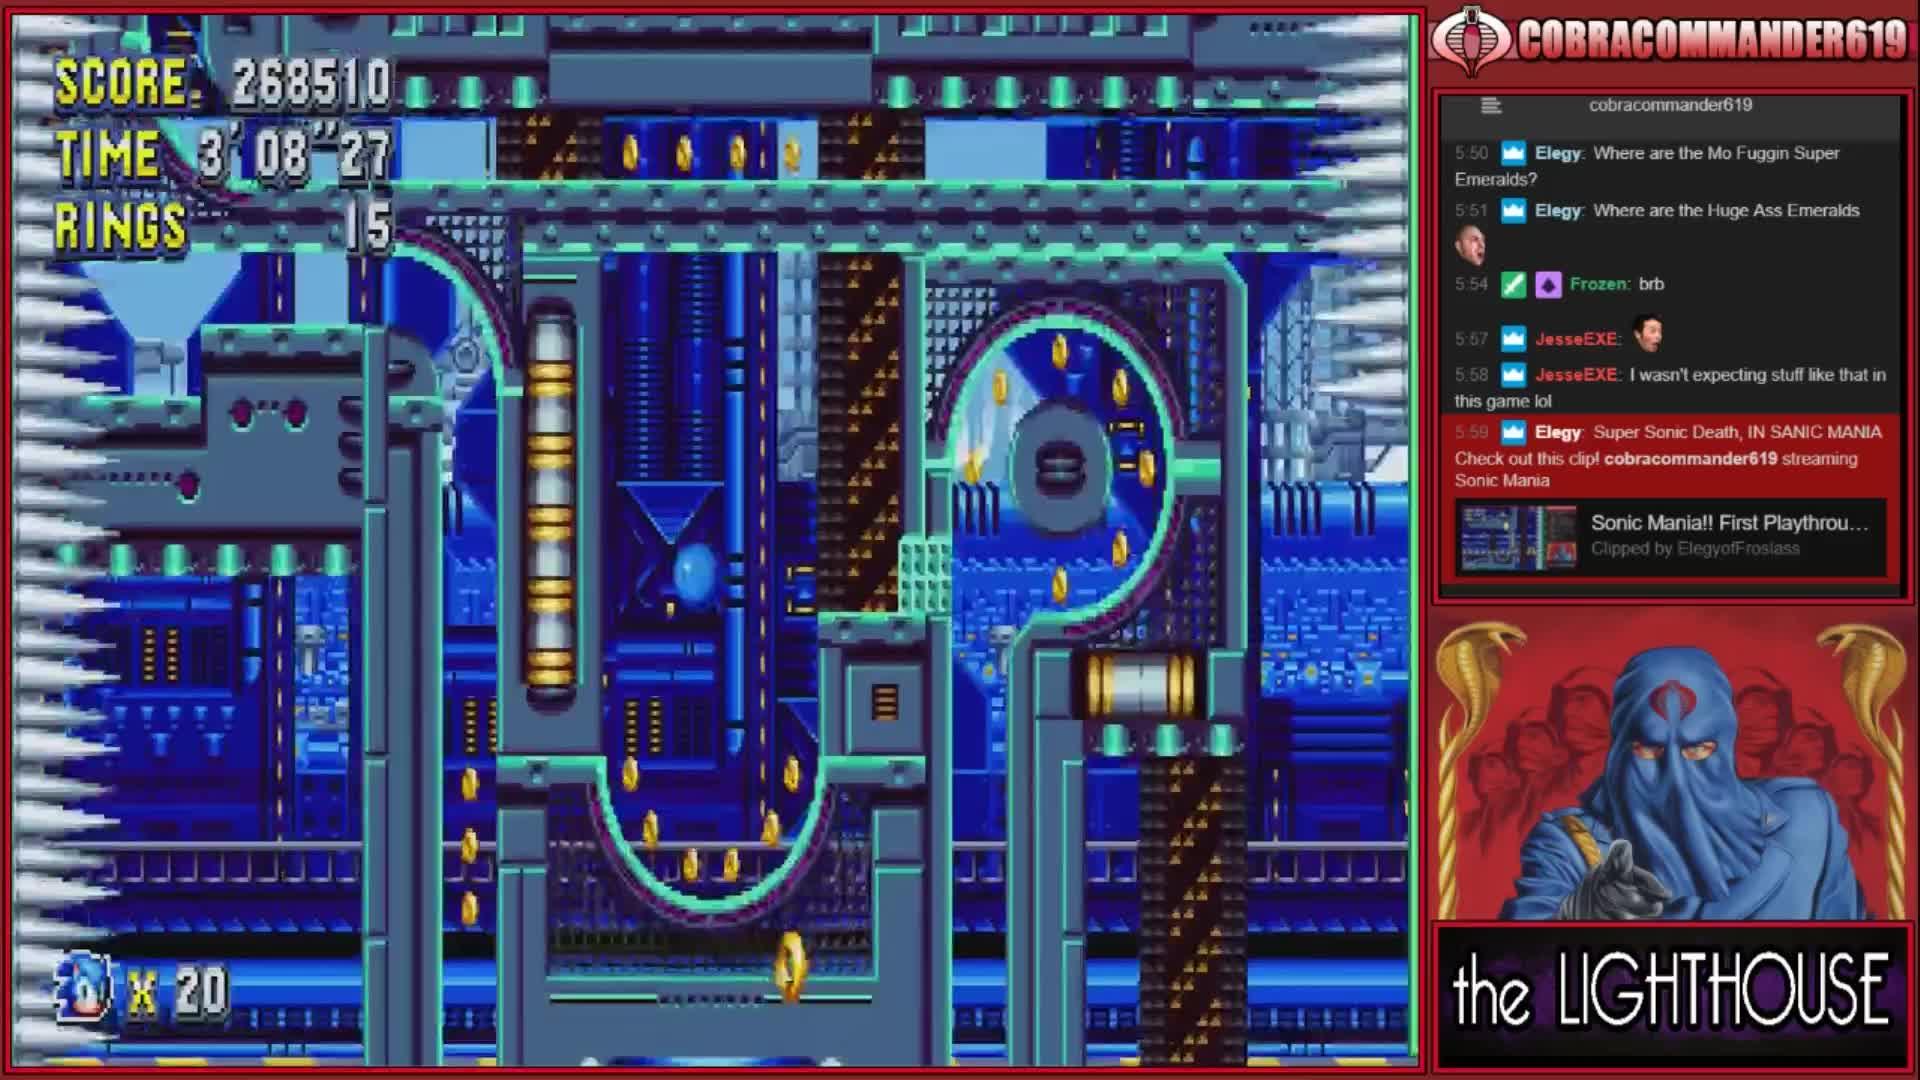 Sonic Mania!! First Playthrough! - Twitch